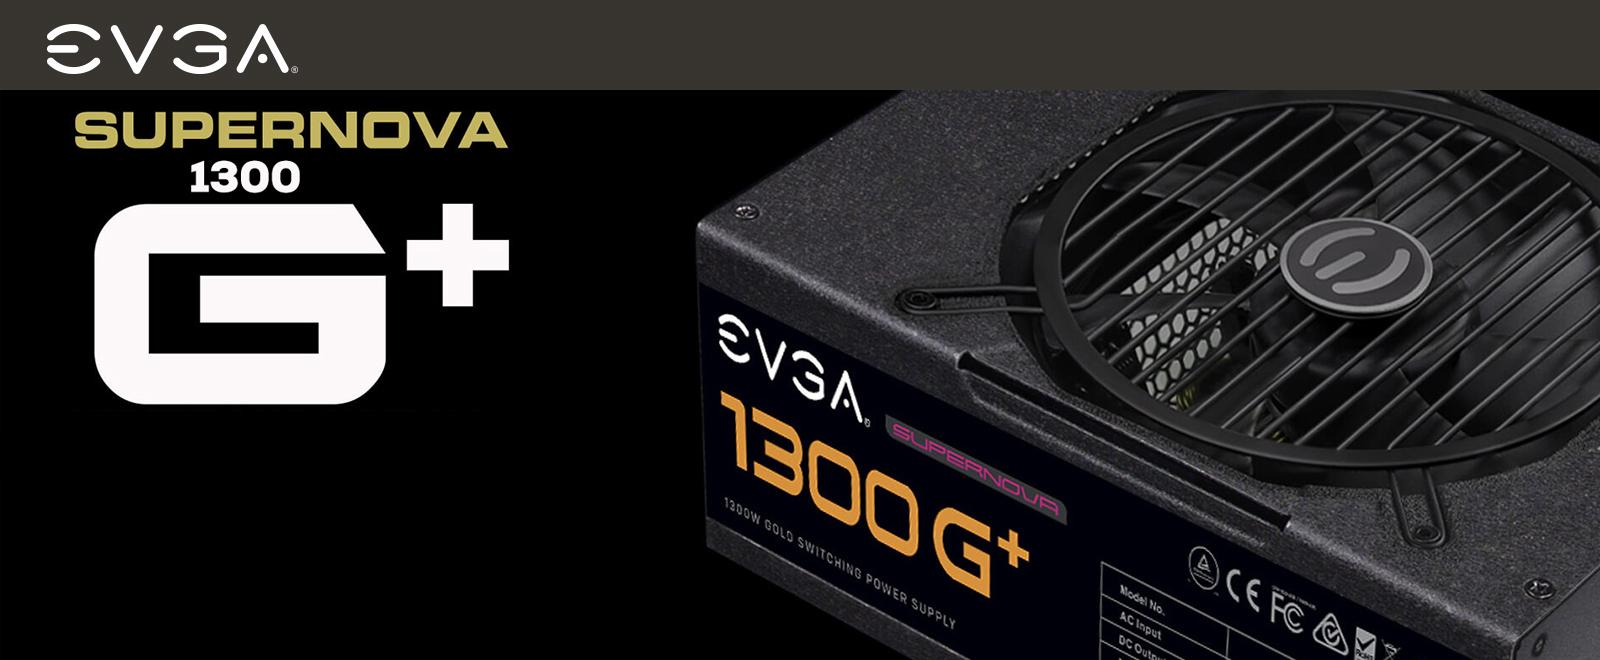 EVGA SuperNOVA 1600 G+ Power Supply